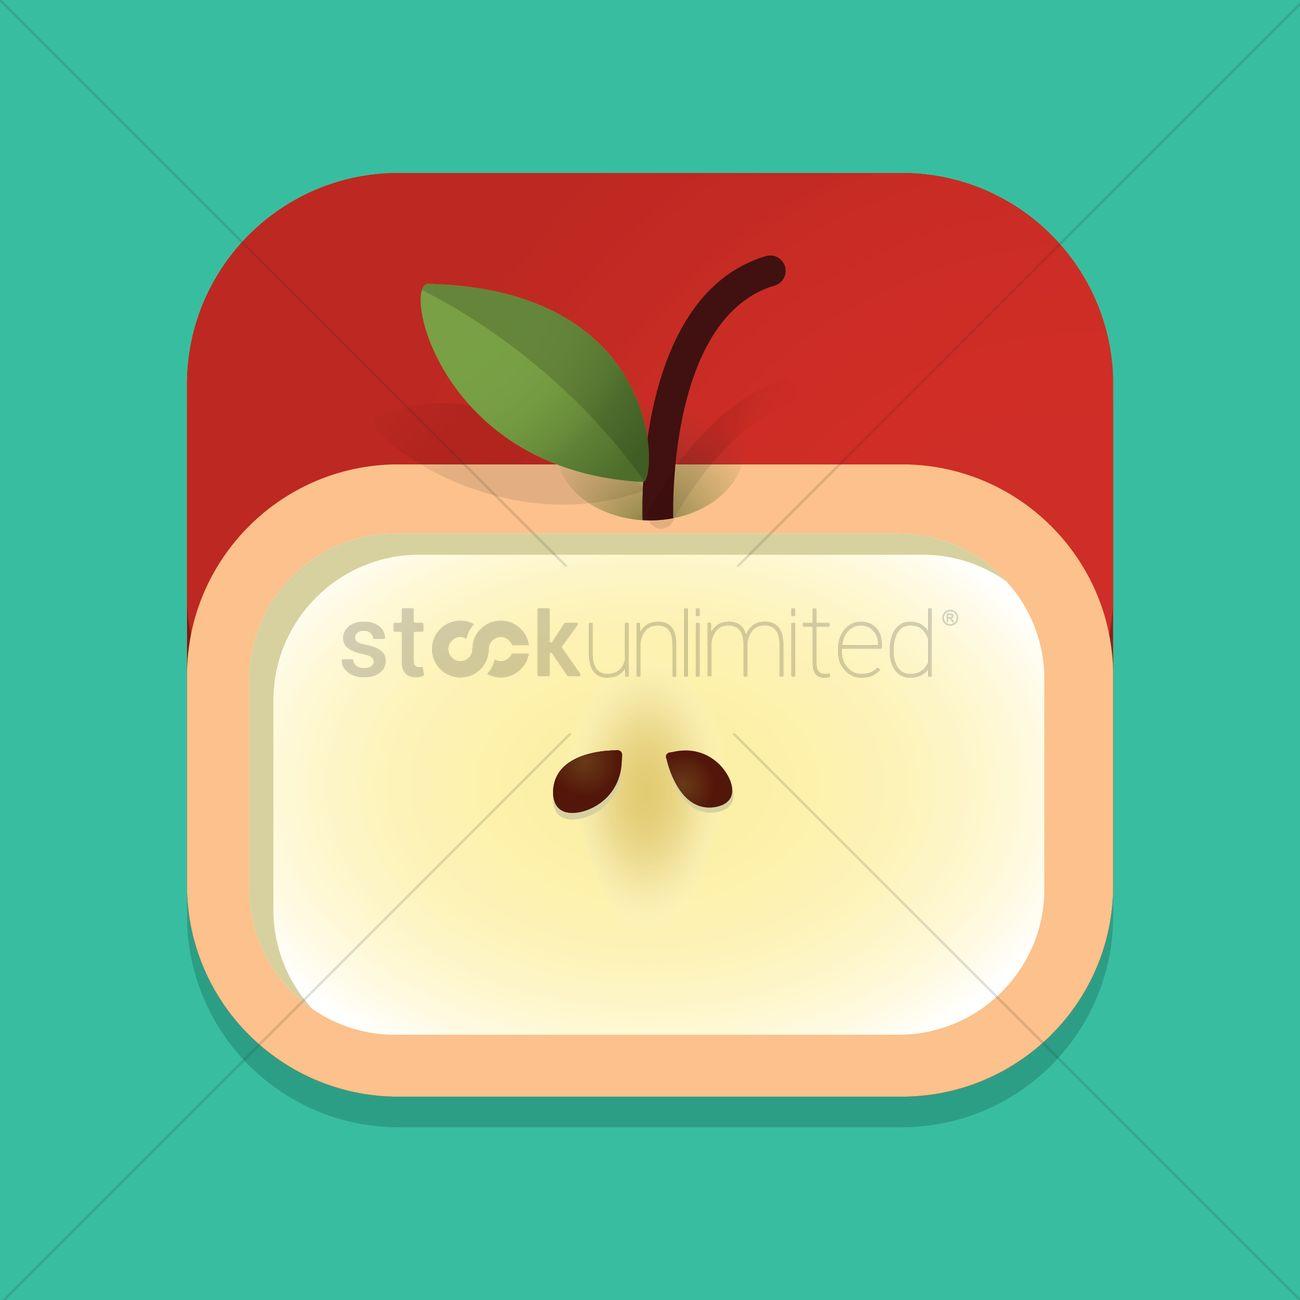 1300x1300 Red Apple Slice Vector Image